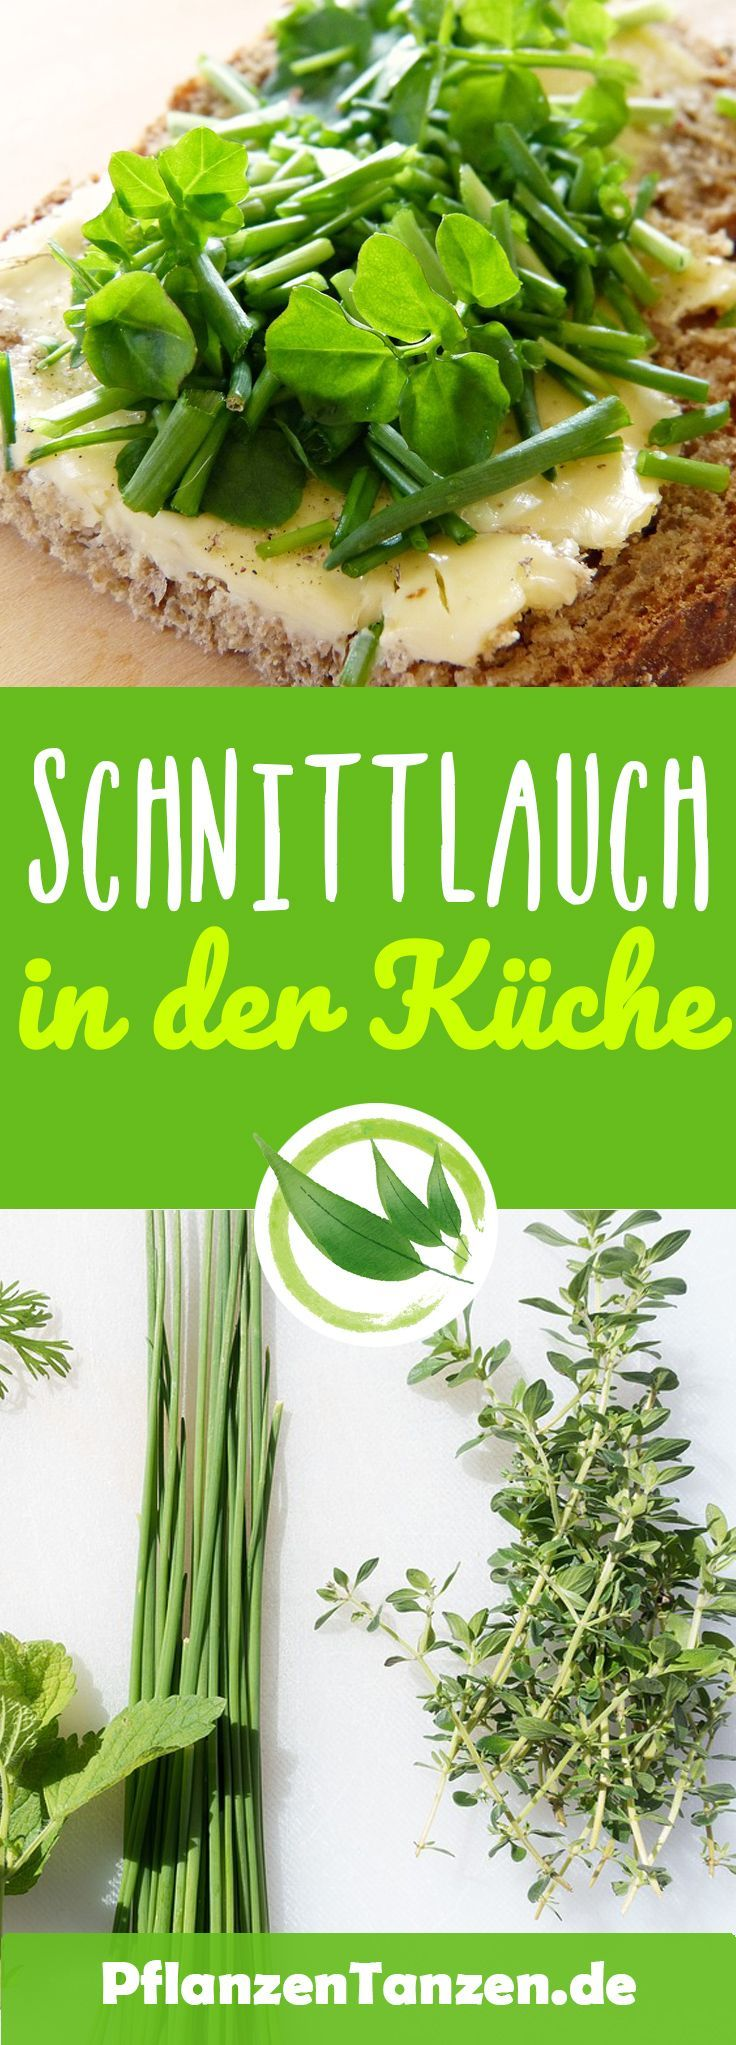 ᐅ】Komplette SCHNITTLAUCH Pflegeanleitung ✿ Perfektes Schnittlauch #kräutergartenbalkon